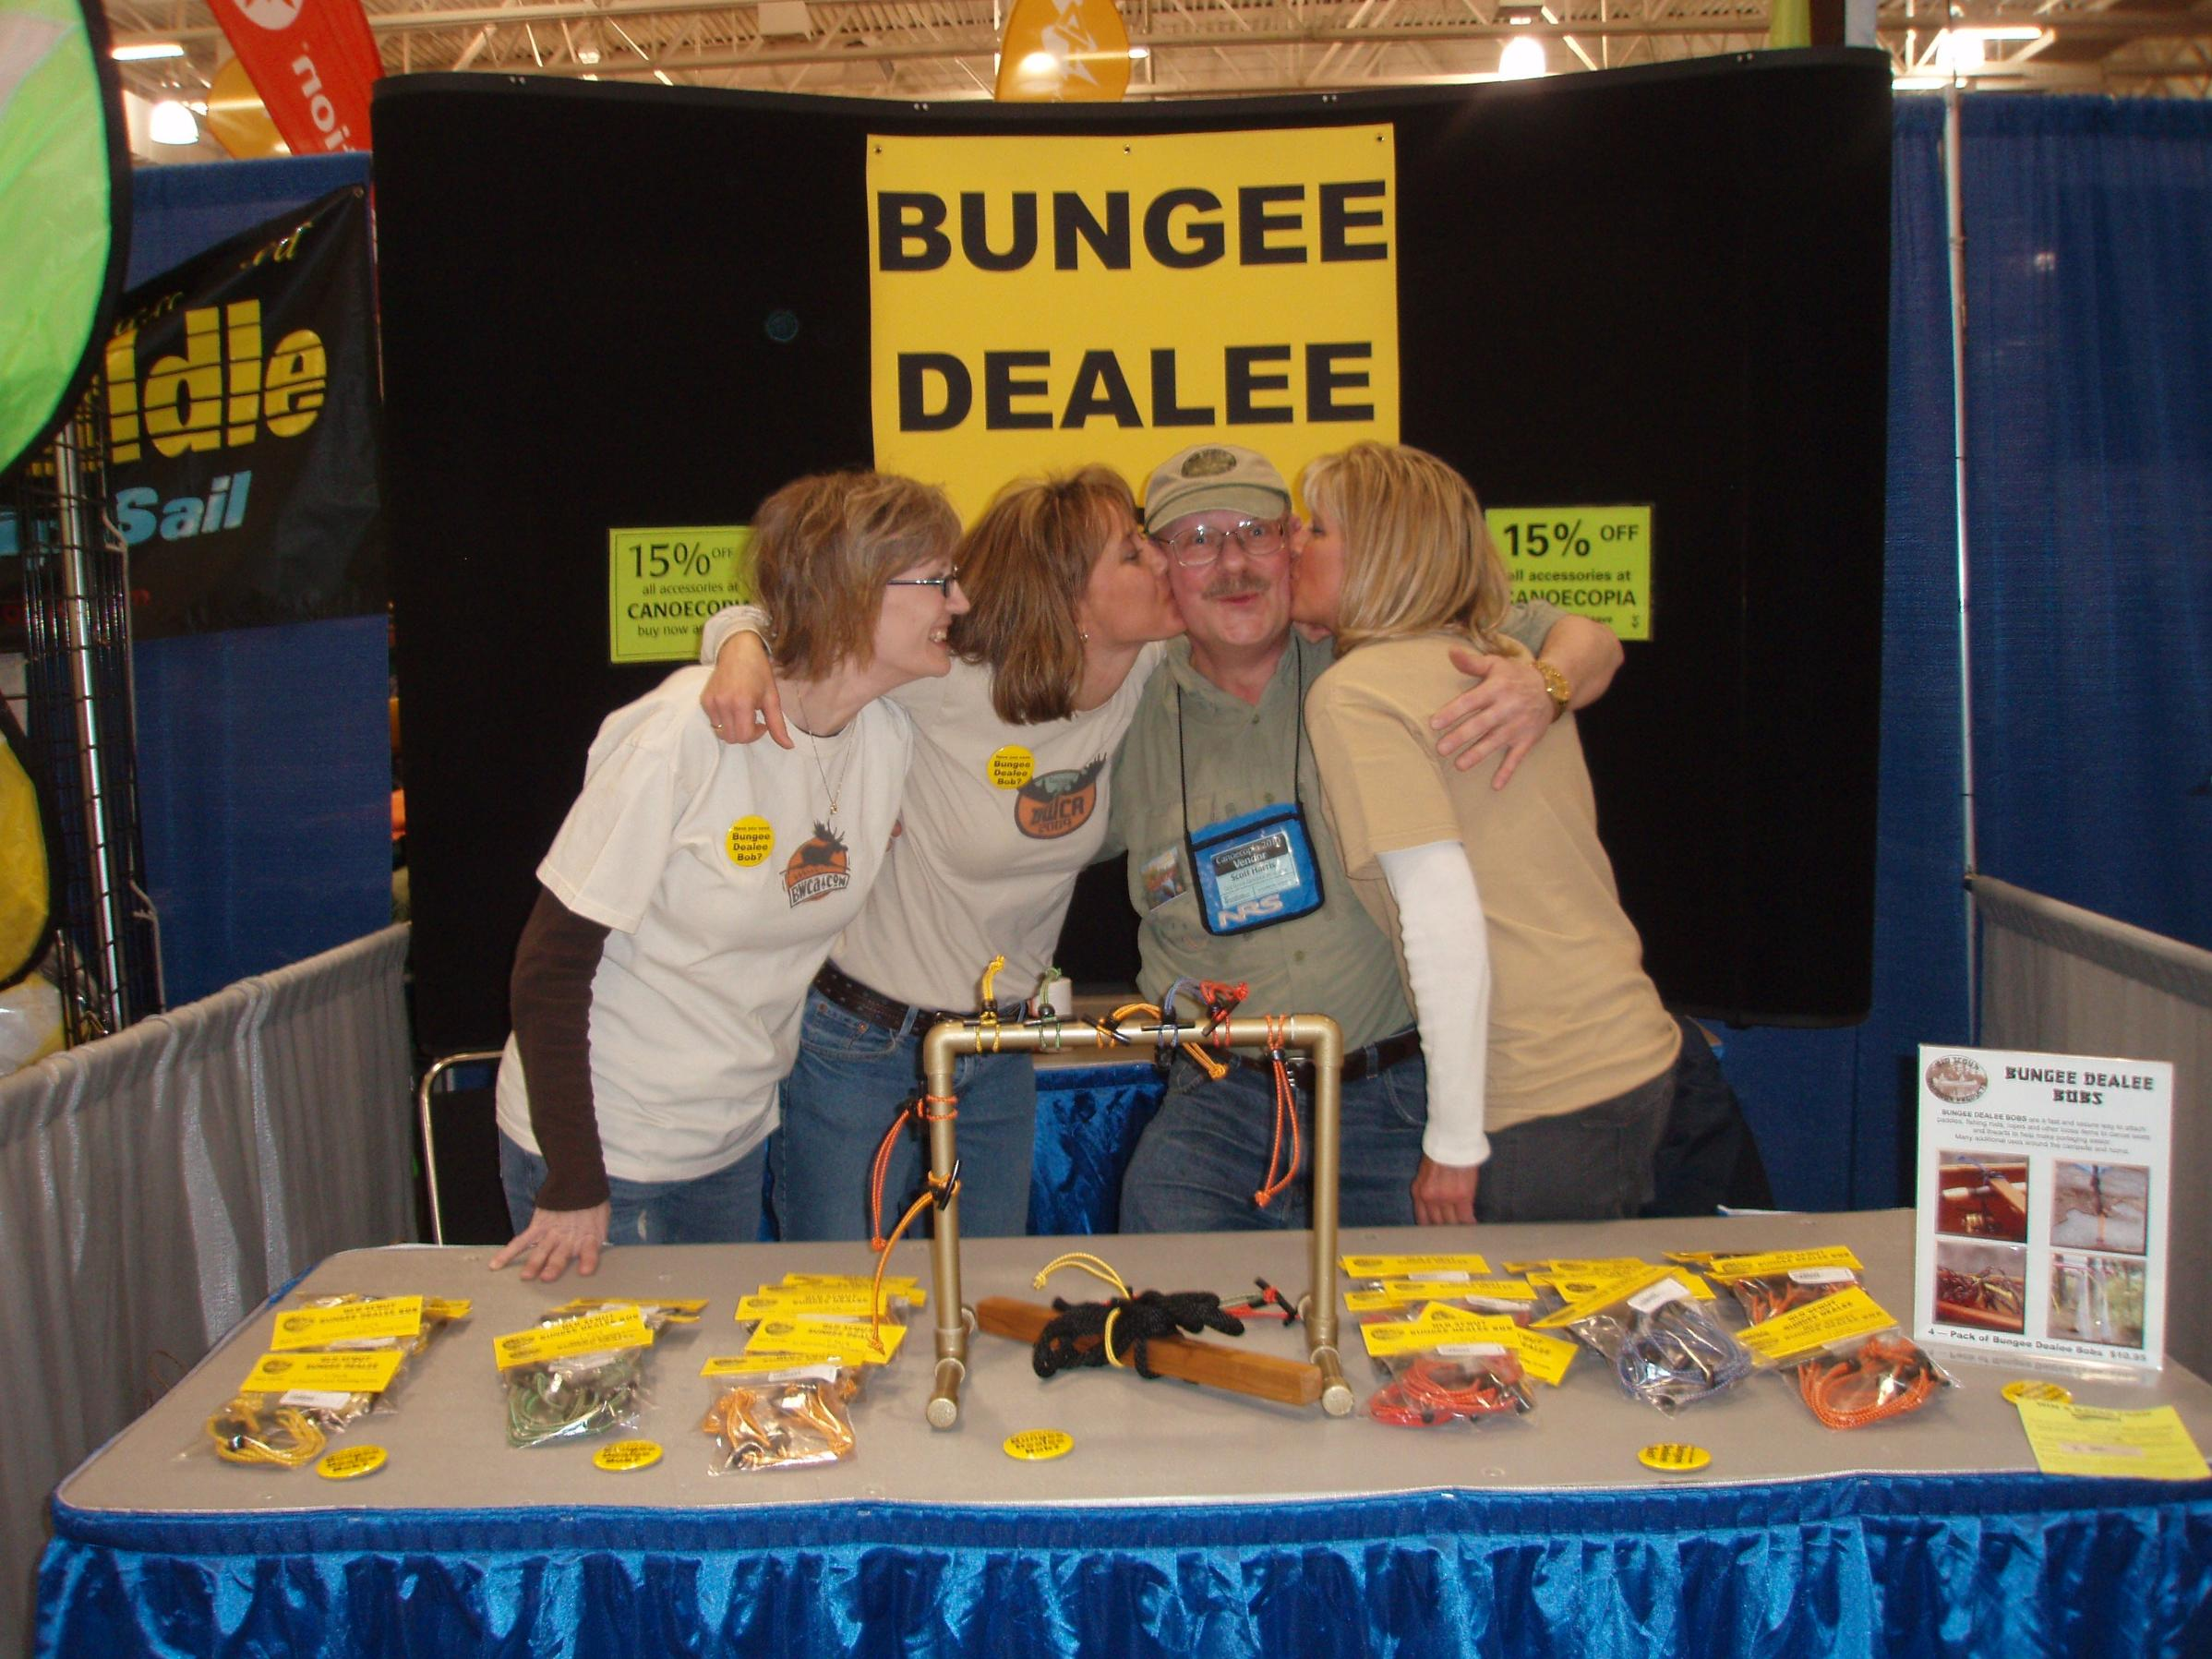 Bungee Dealee Bob Babes